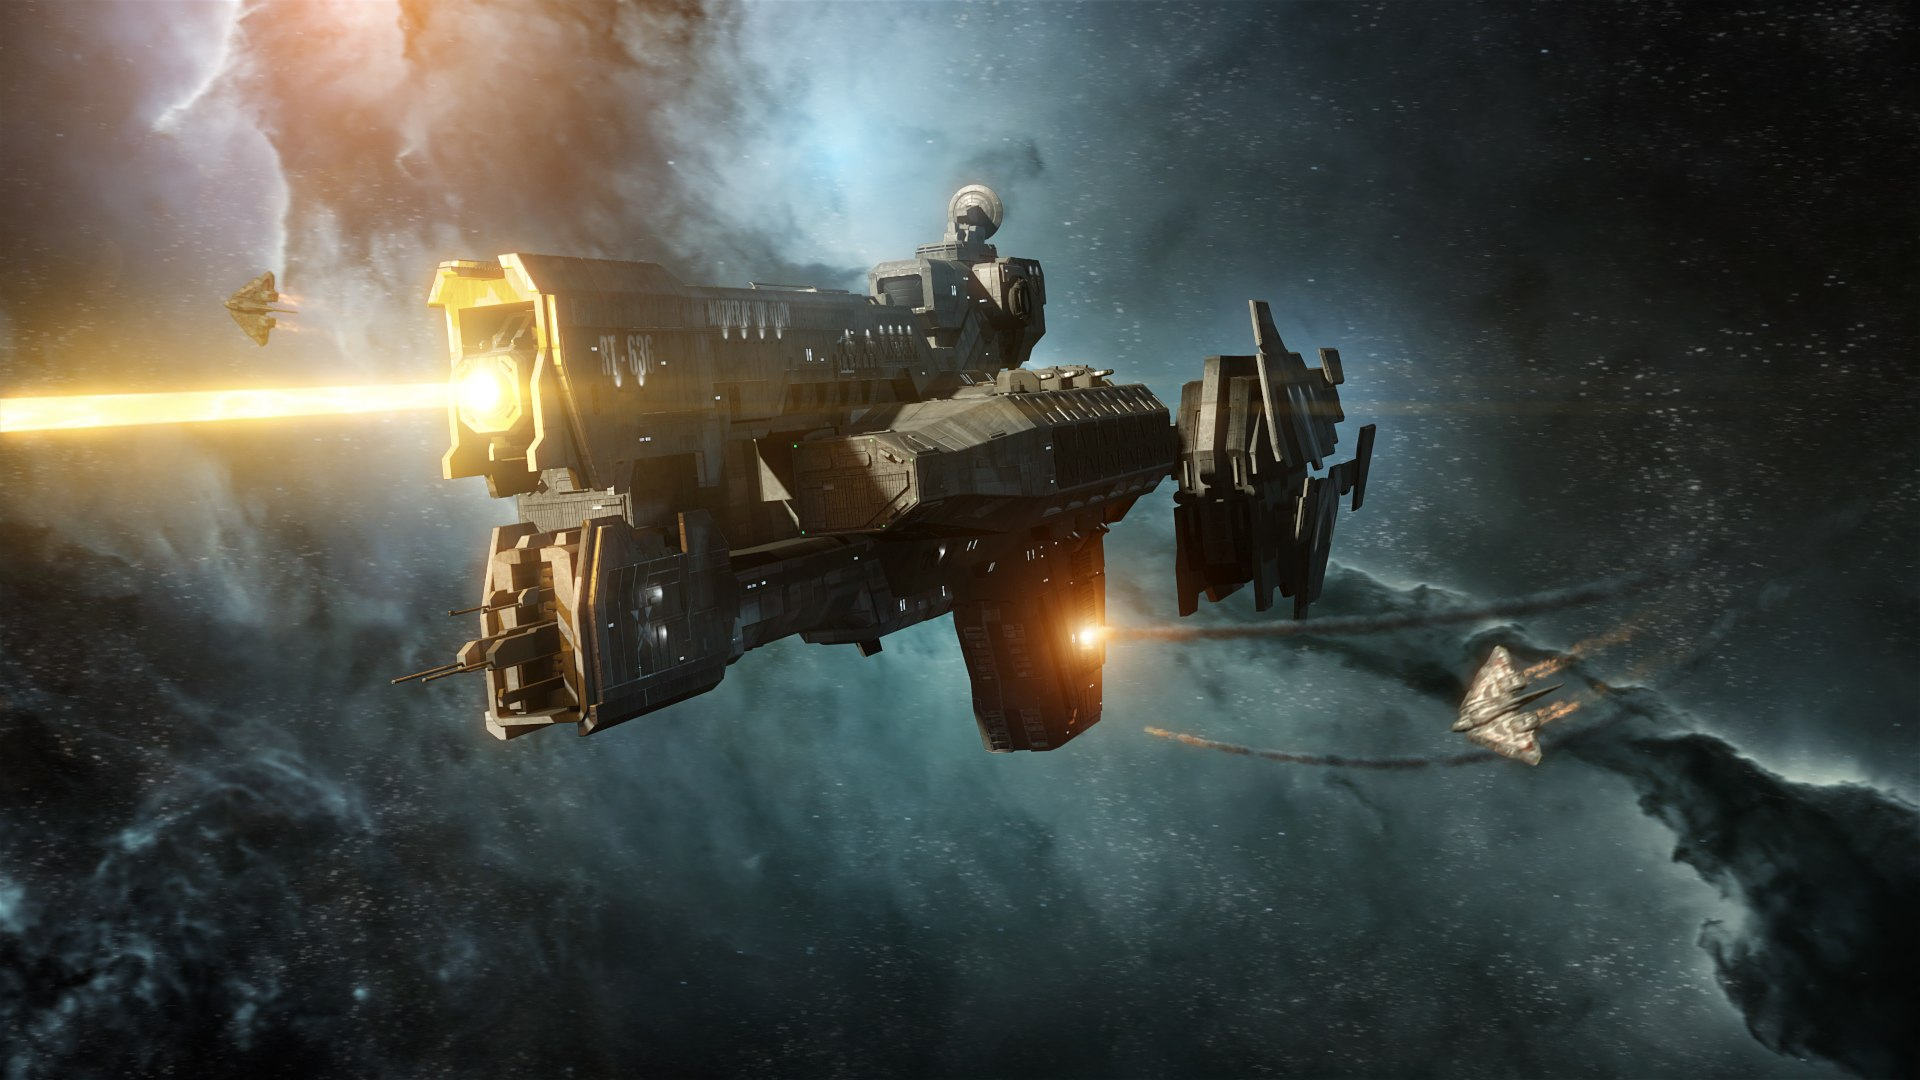 High Resolution Amazing Sci Fi Space Battle Wallpaper HD 9 ...